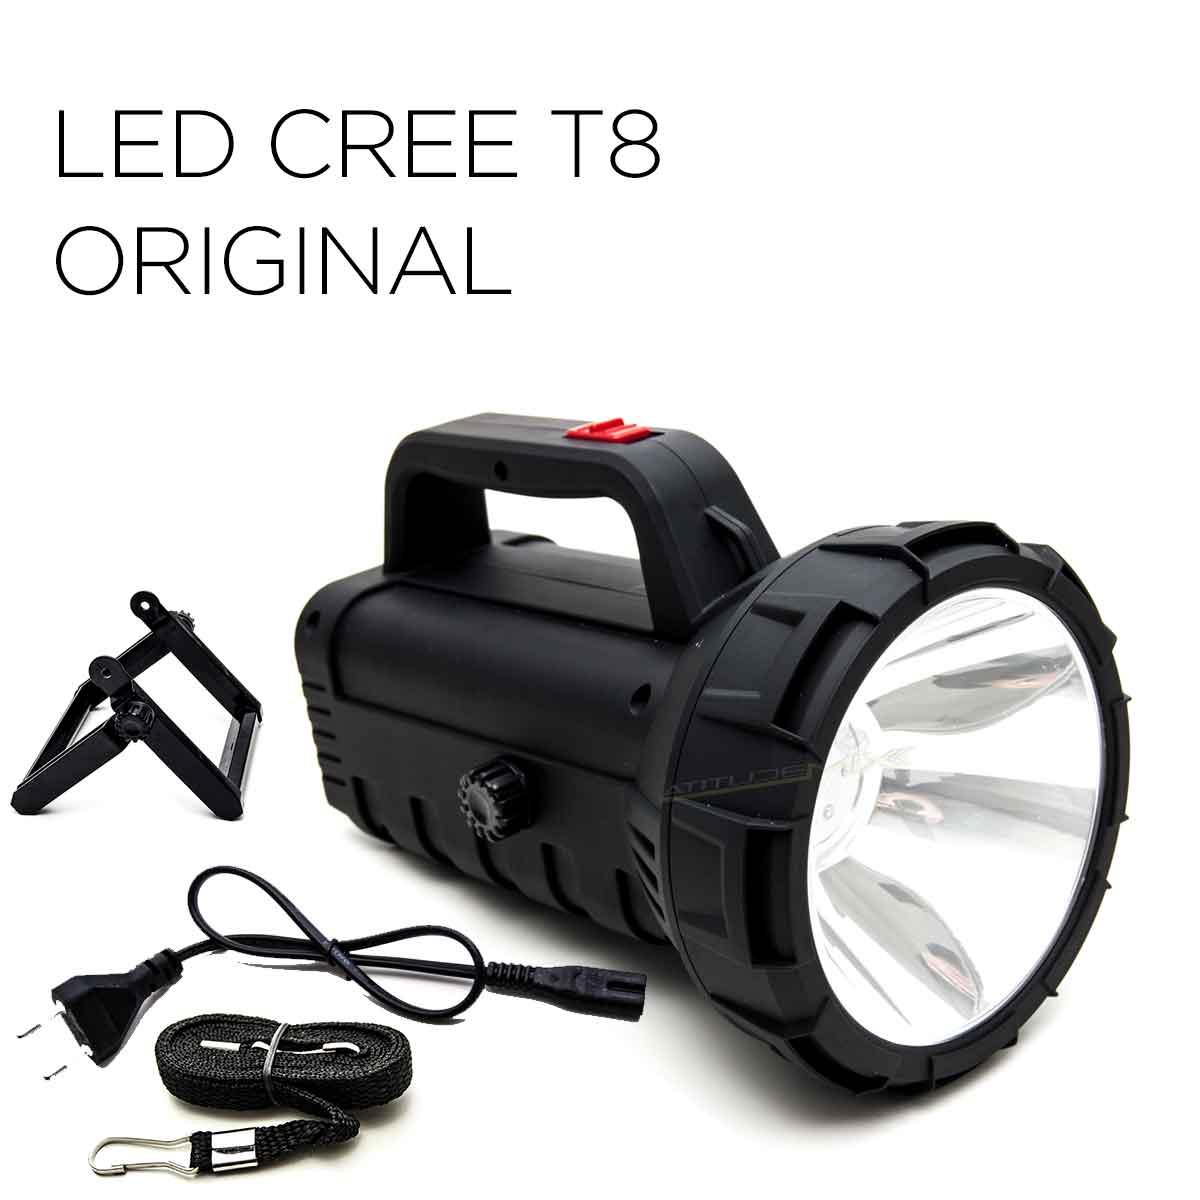 Lanterna Holofote 5000 Metros Recarregável Led Cree T8